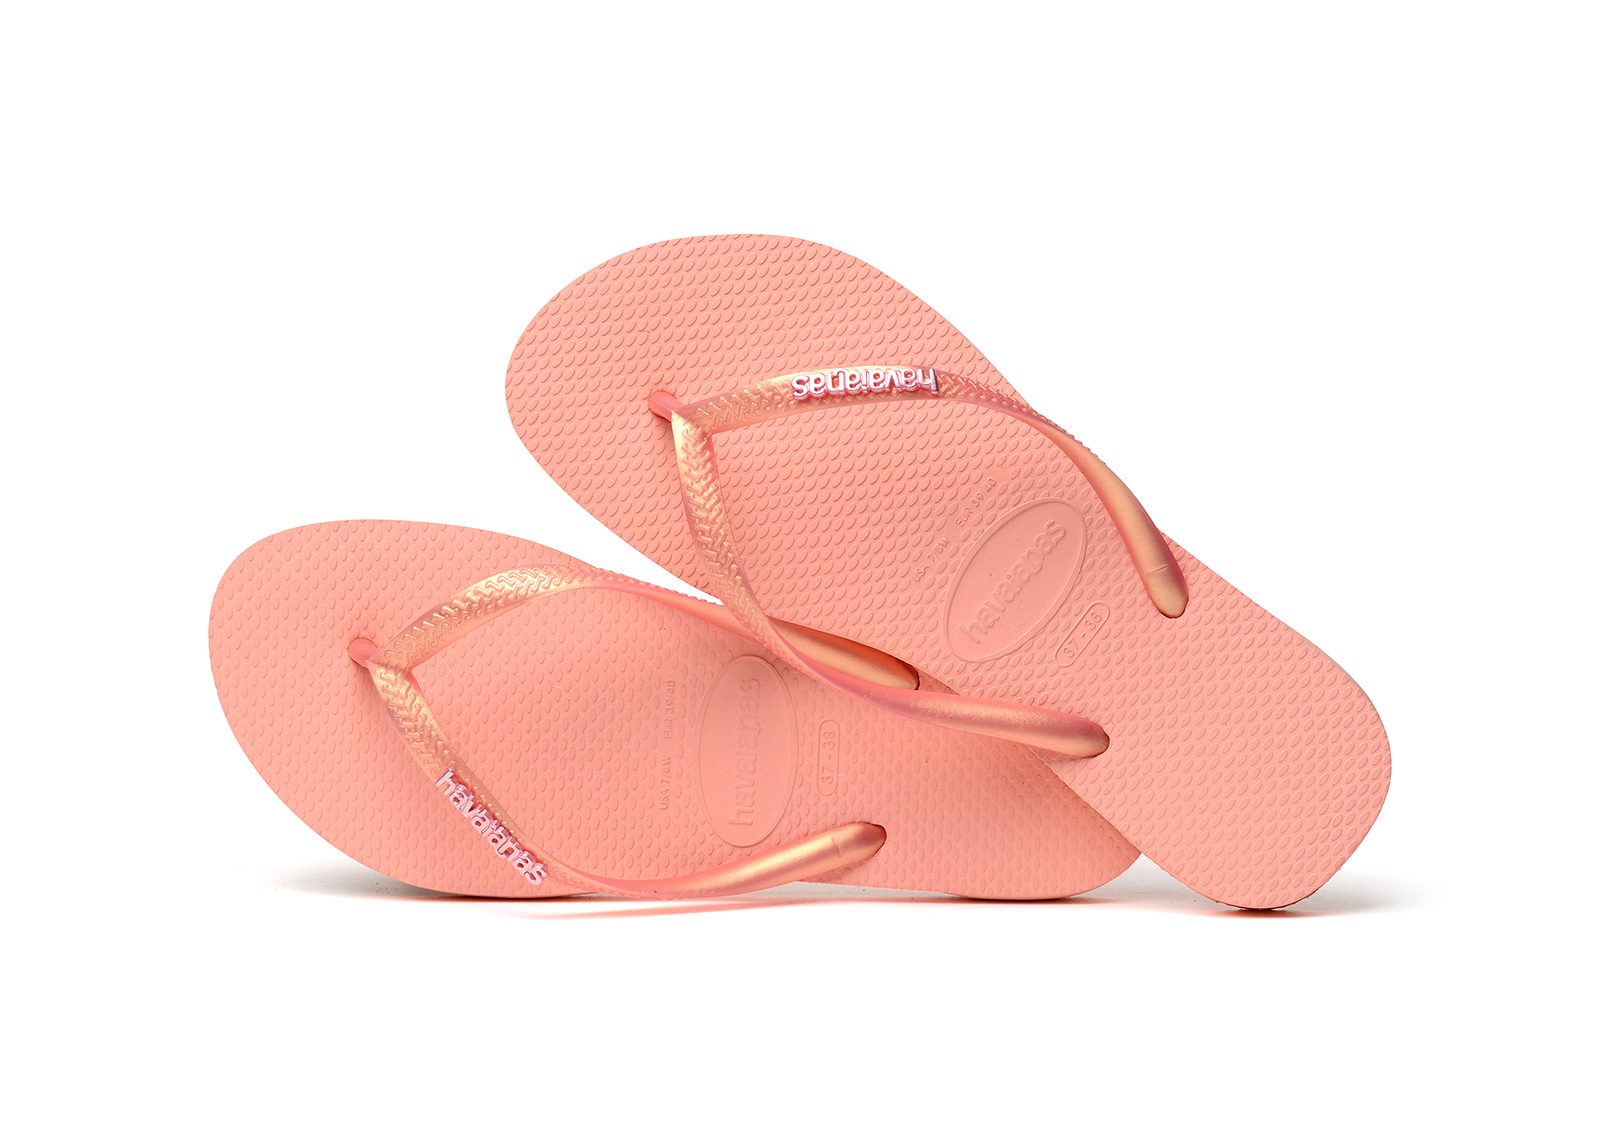 ac0f2aafd Flip-Flops Pink Flip Flops - Havaianas Slim Logo Metallic Light Pink